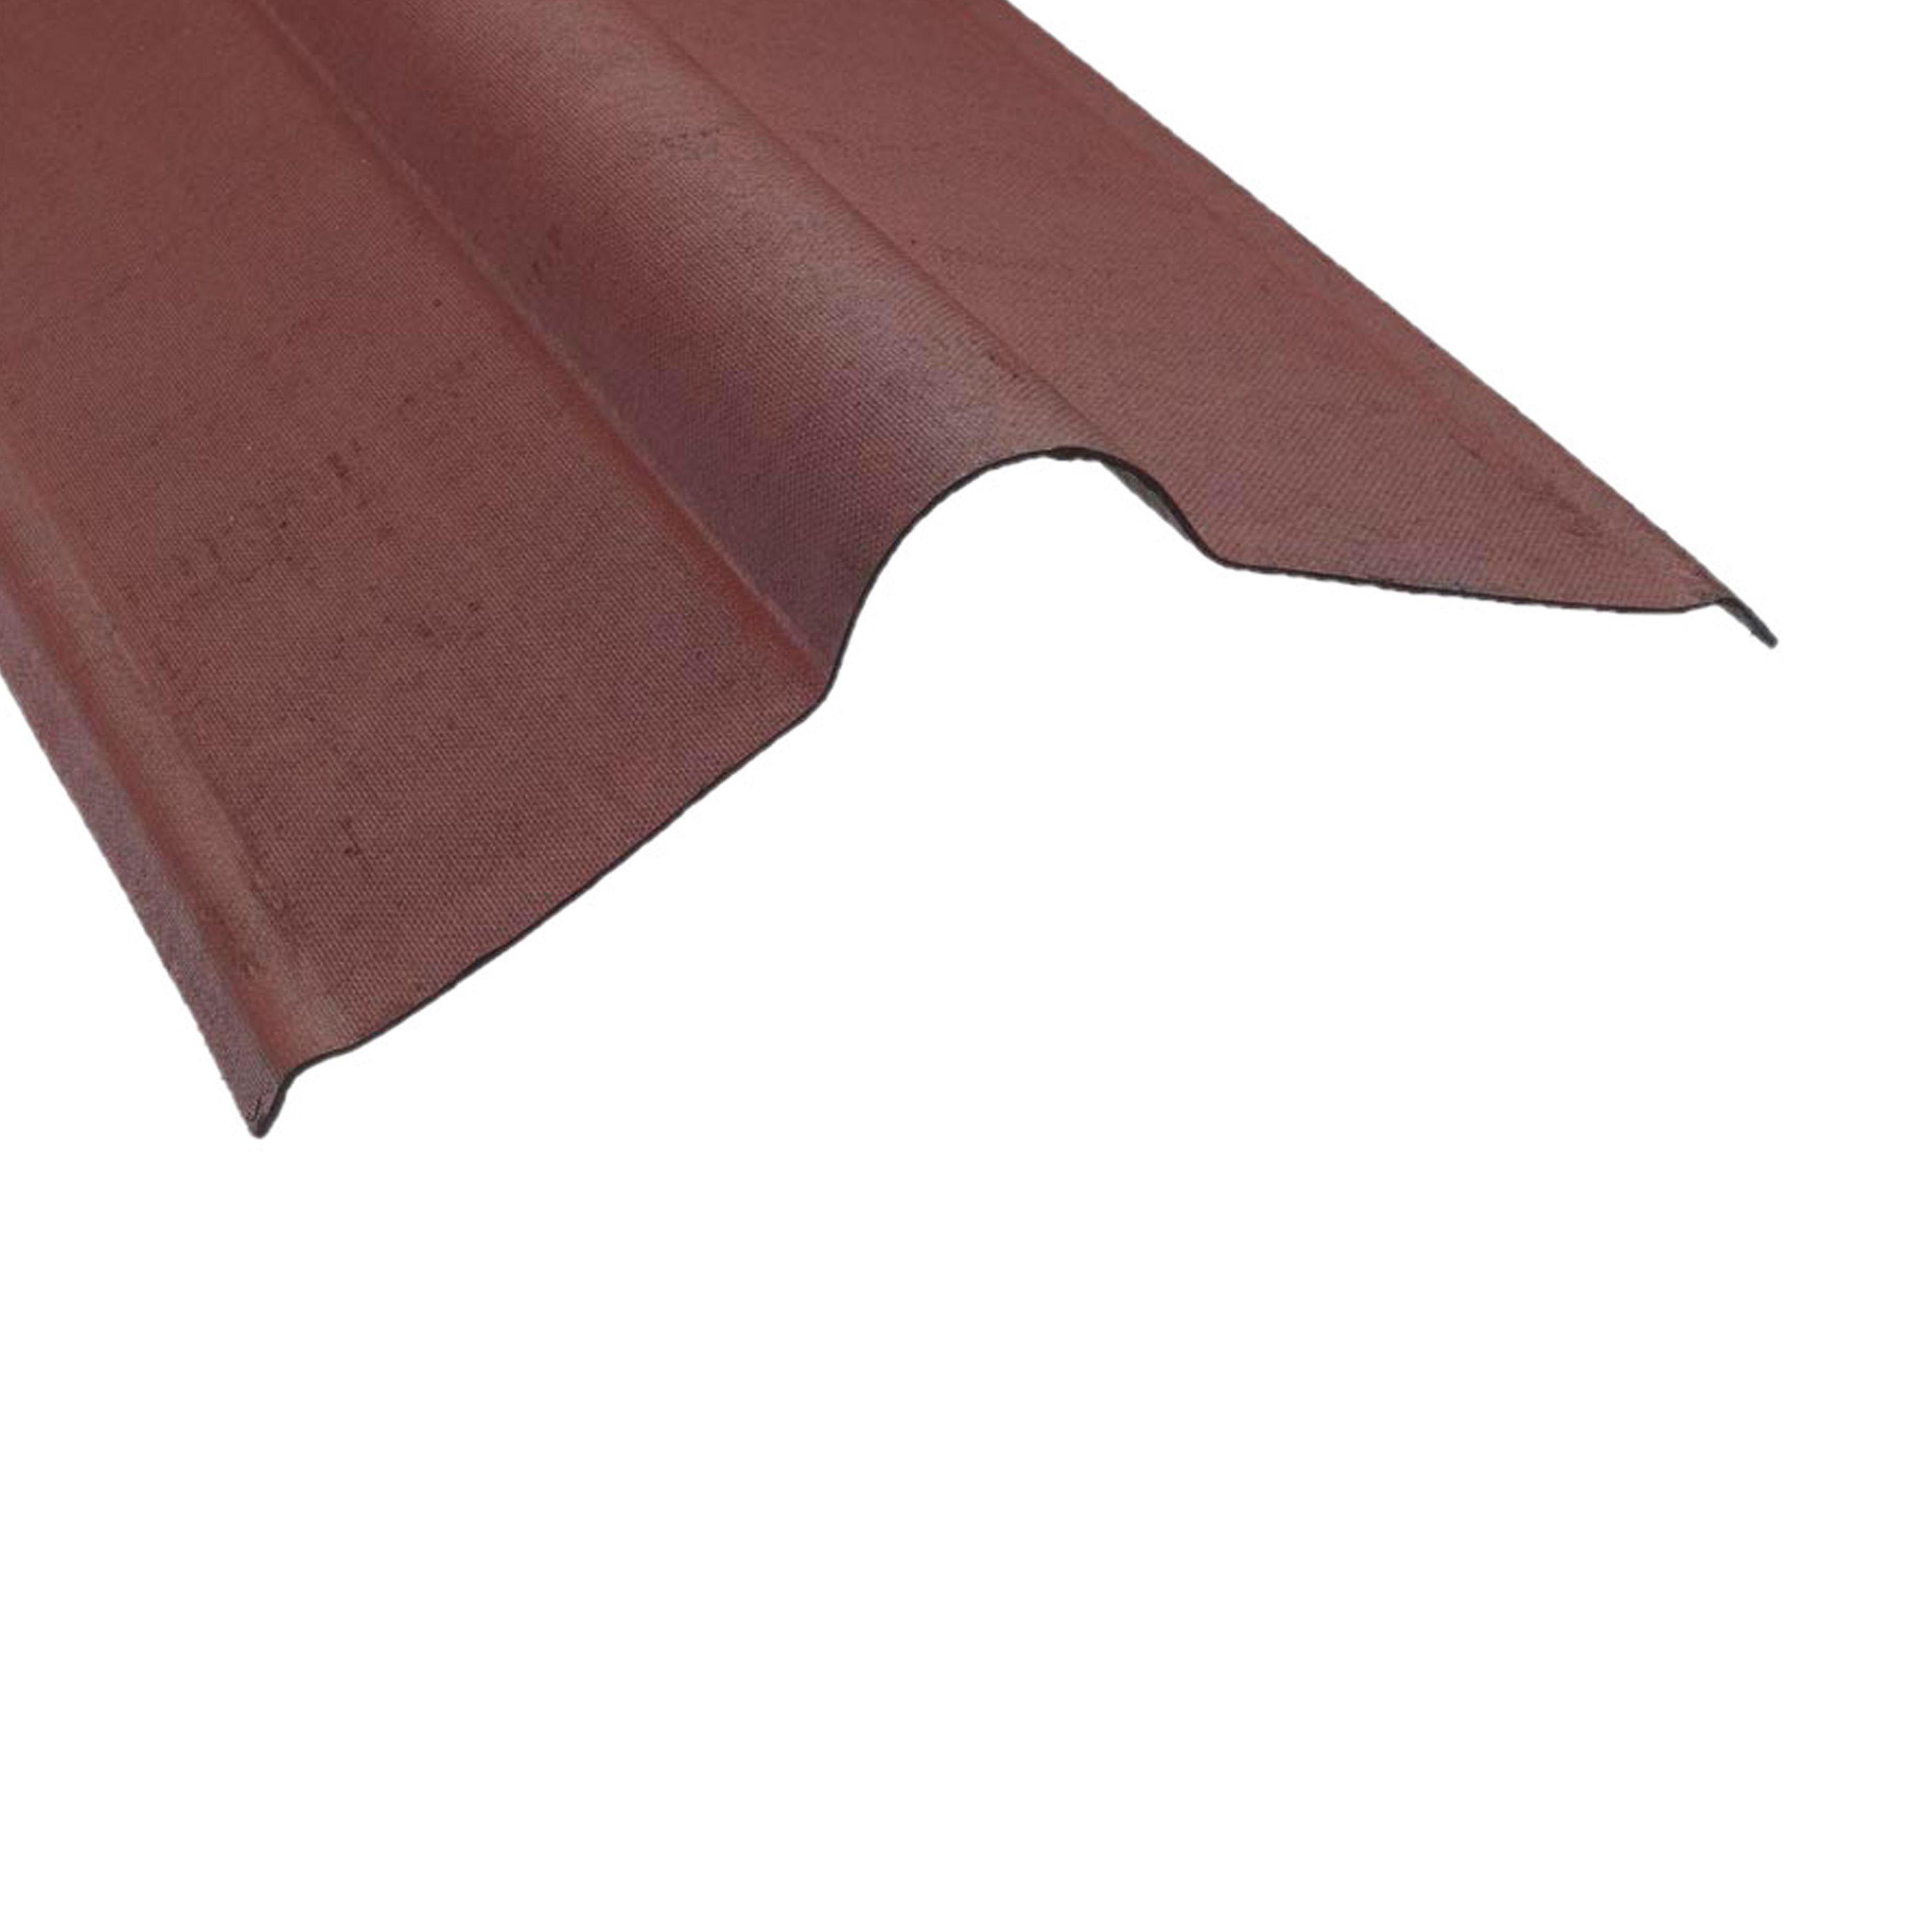 Coroline Corrugated Bituminous Roofing Sheet L 900mm 420mm Ridge Piece Diy At B Q